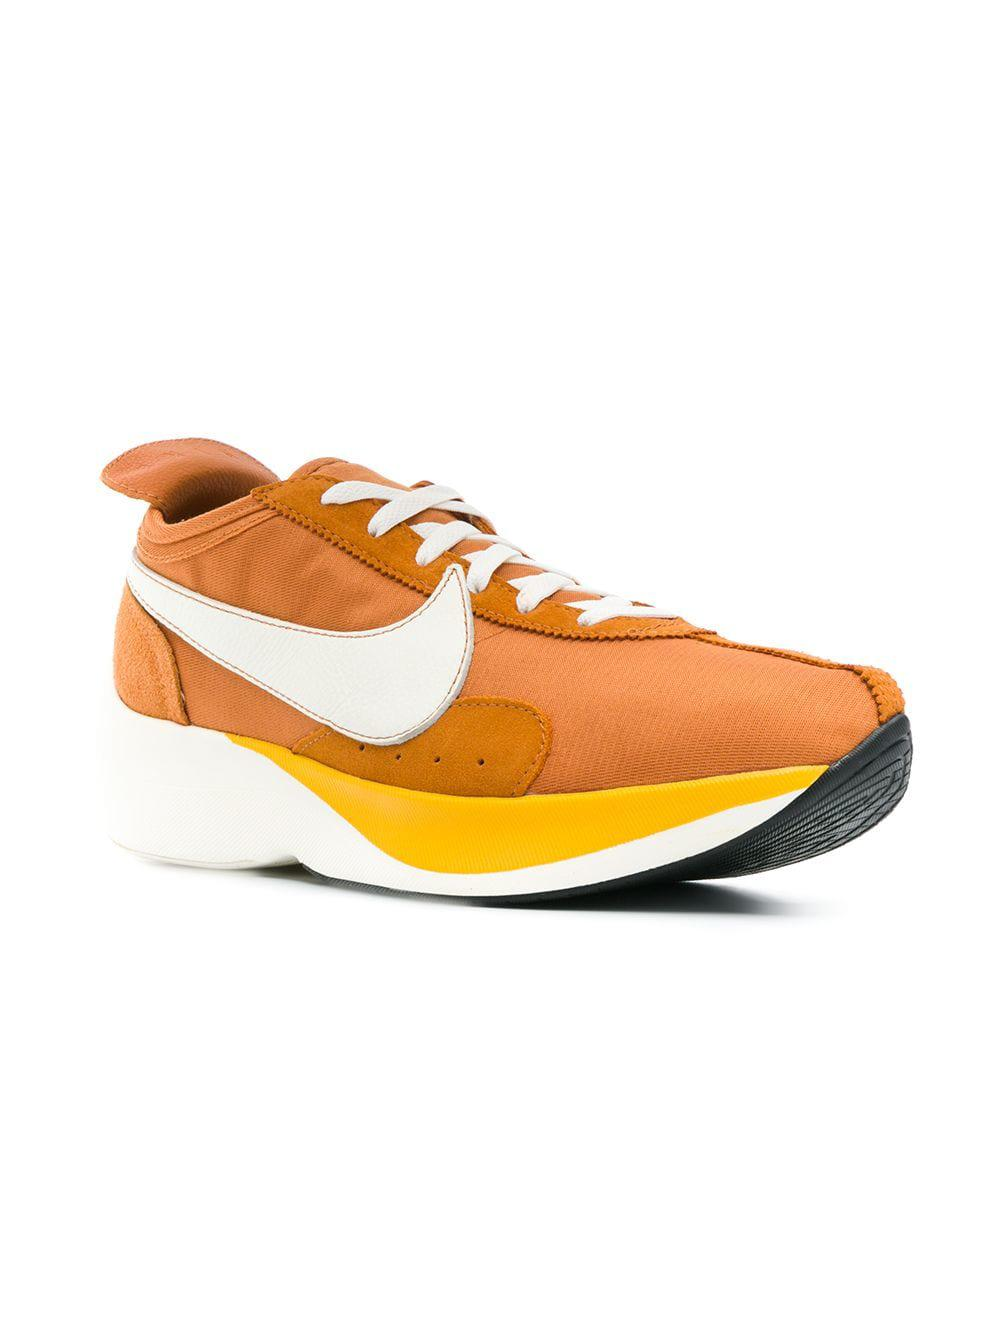 Lyst - Nike Moon Racer Sneakers in Orange for Men - Save 3% df5149da3